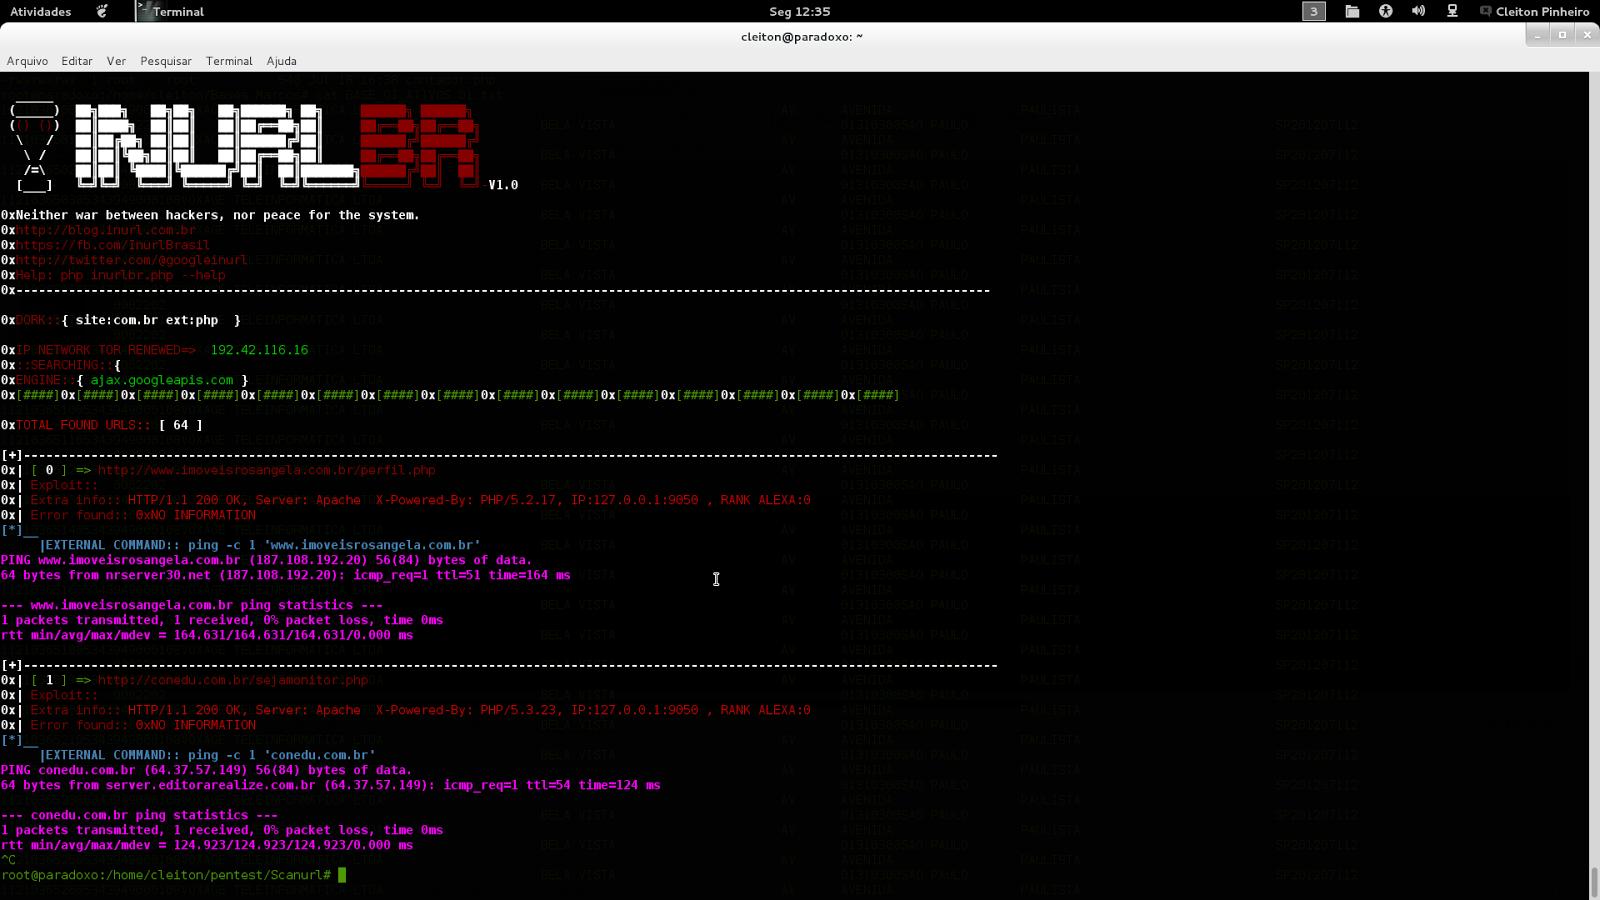 Testando novo Scanner inurl 1.0 beta